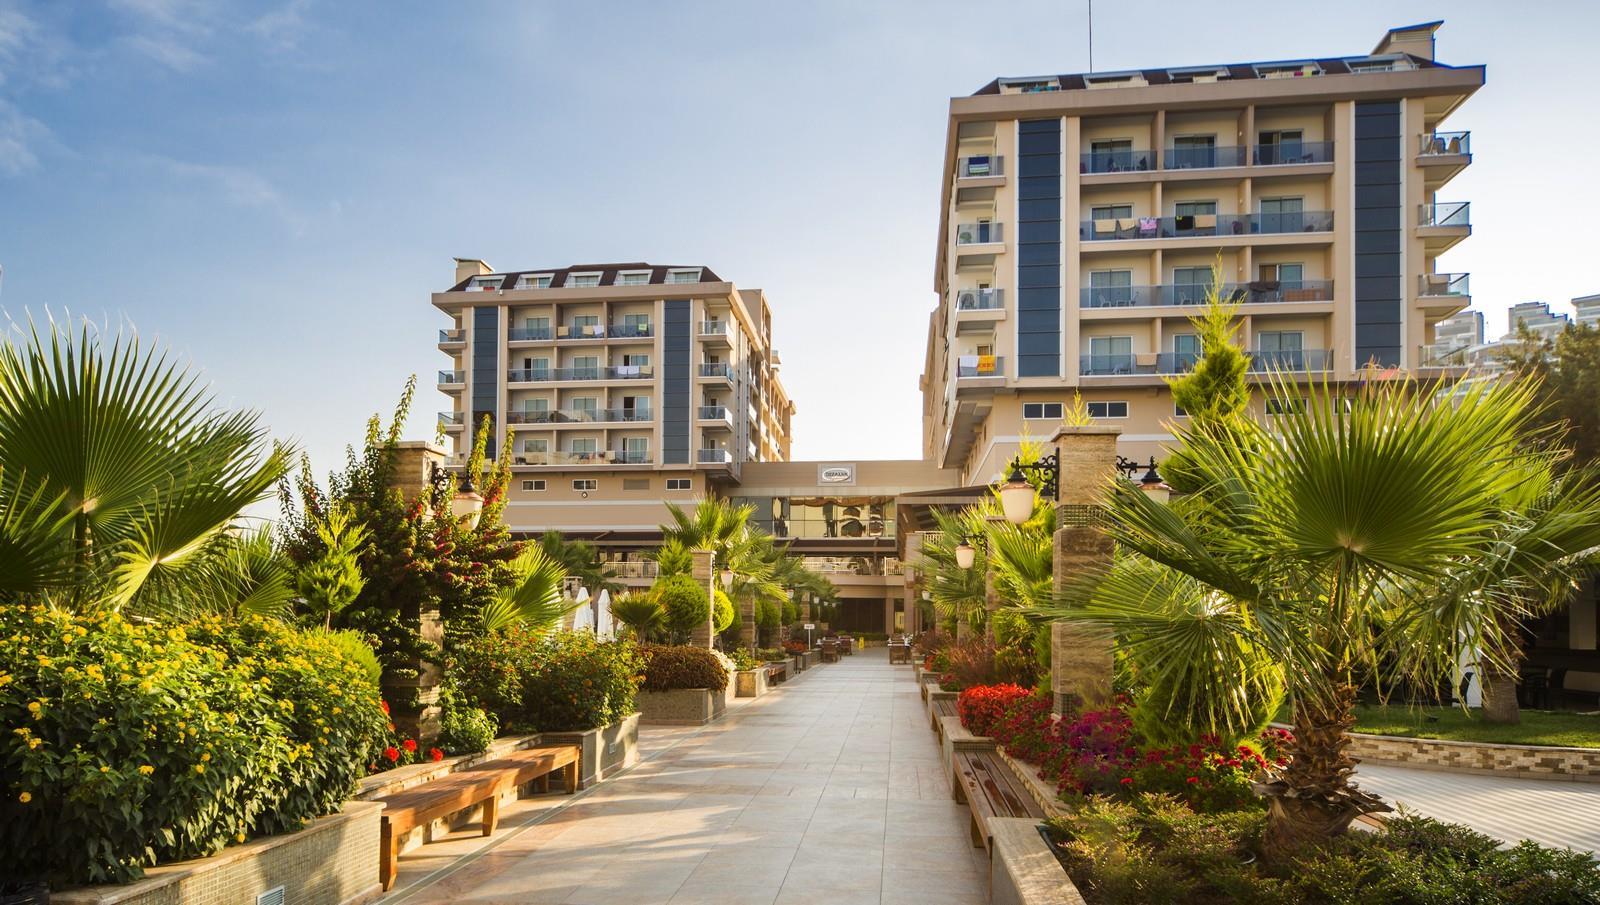 dizalya-palm-garden-genel-011